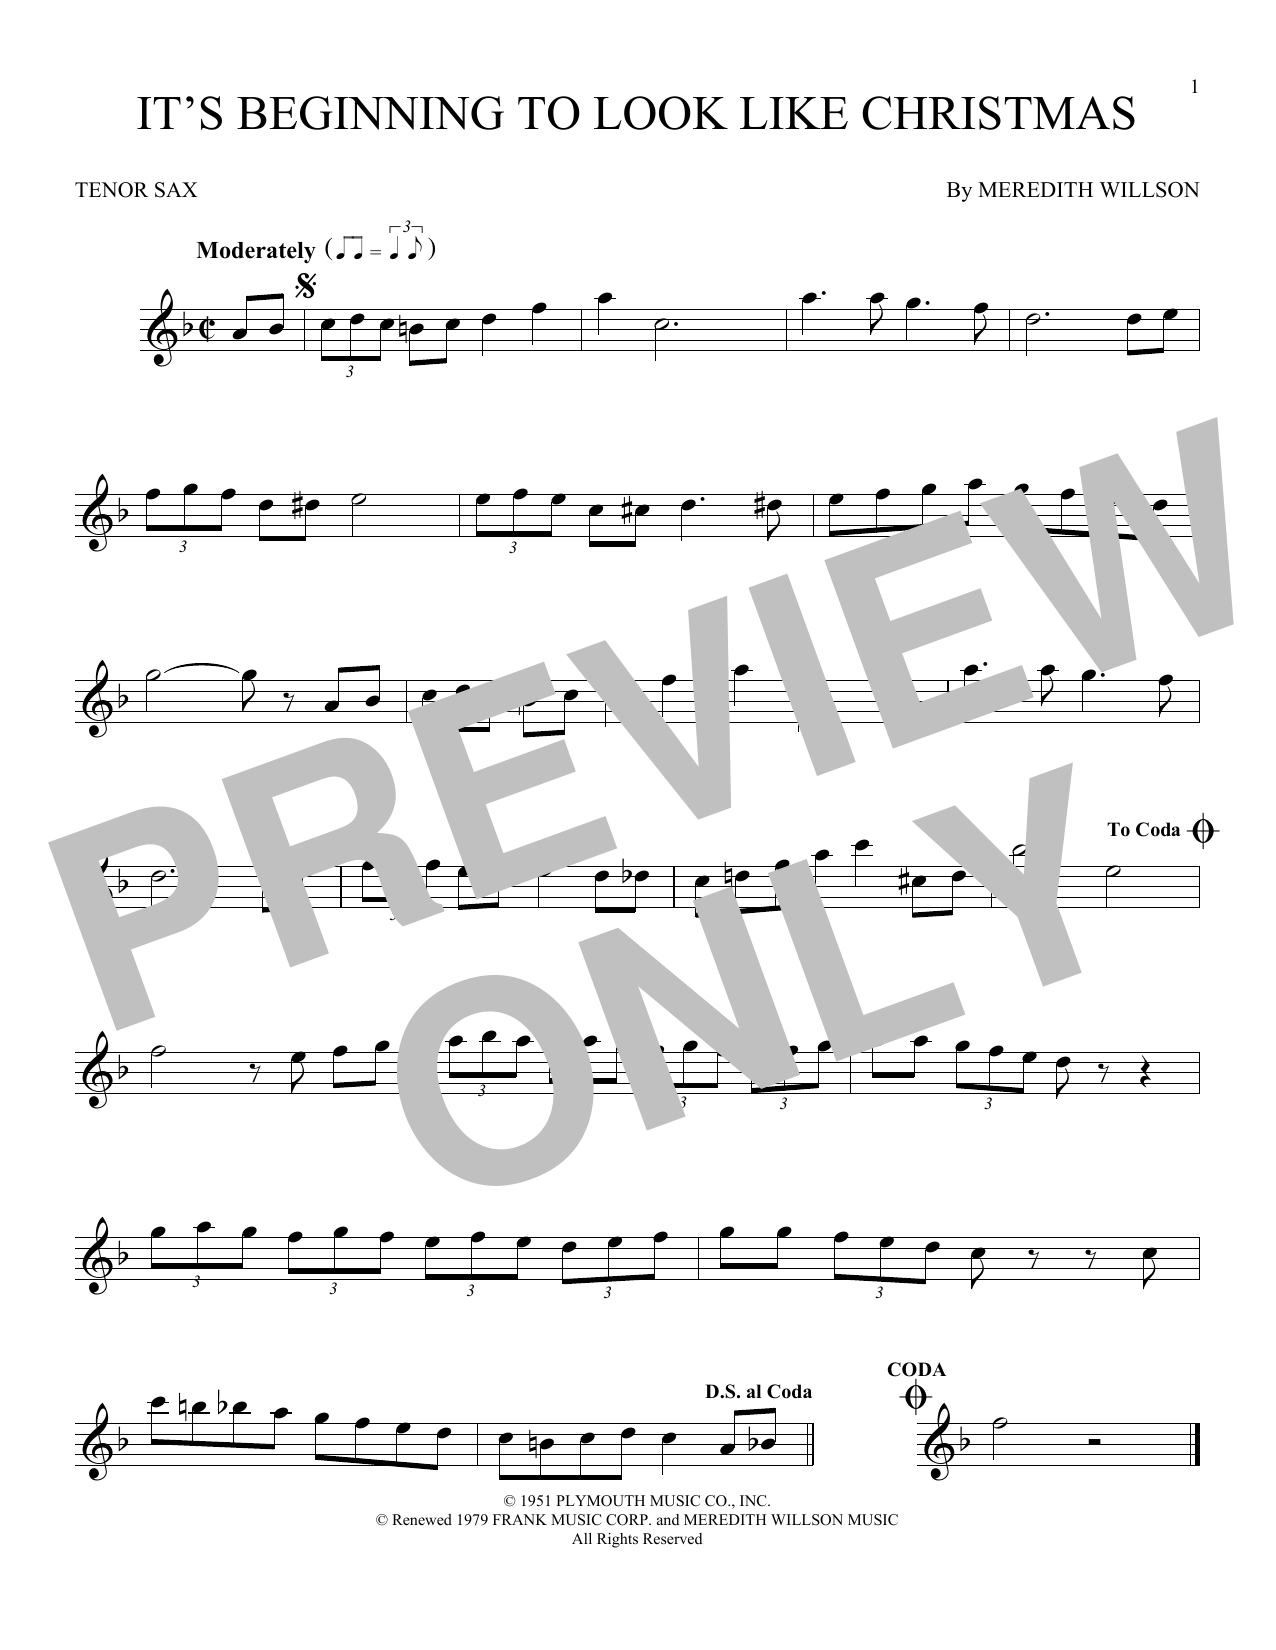 Sheet Music Digital Files To Print - Licensed Meredith Willson ...